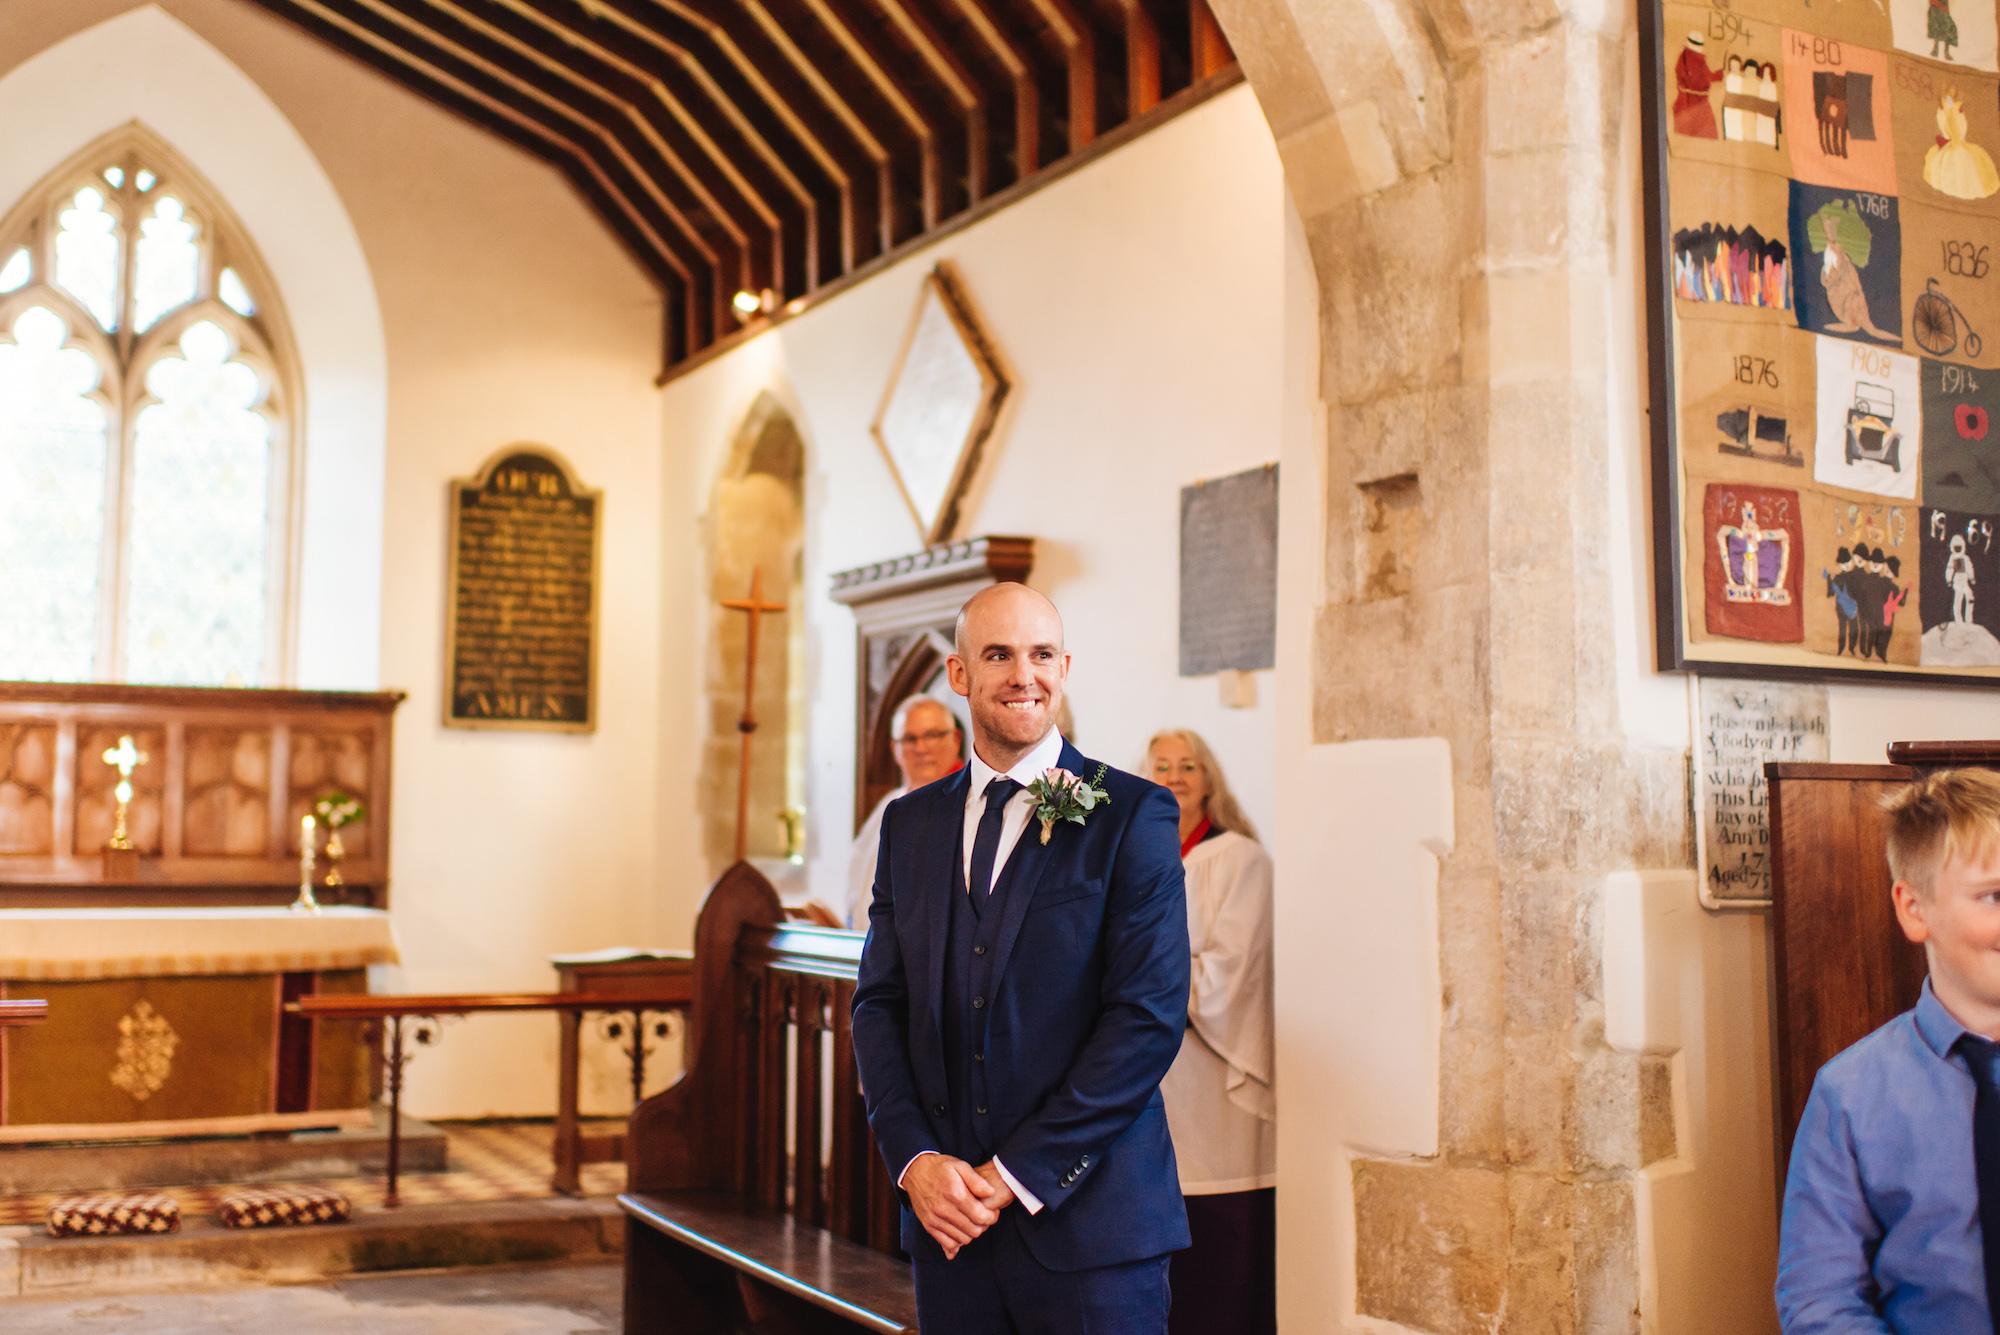 04_Rushall_manor_wiltshire_wedding_photography_groom_church.jpg